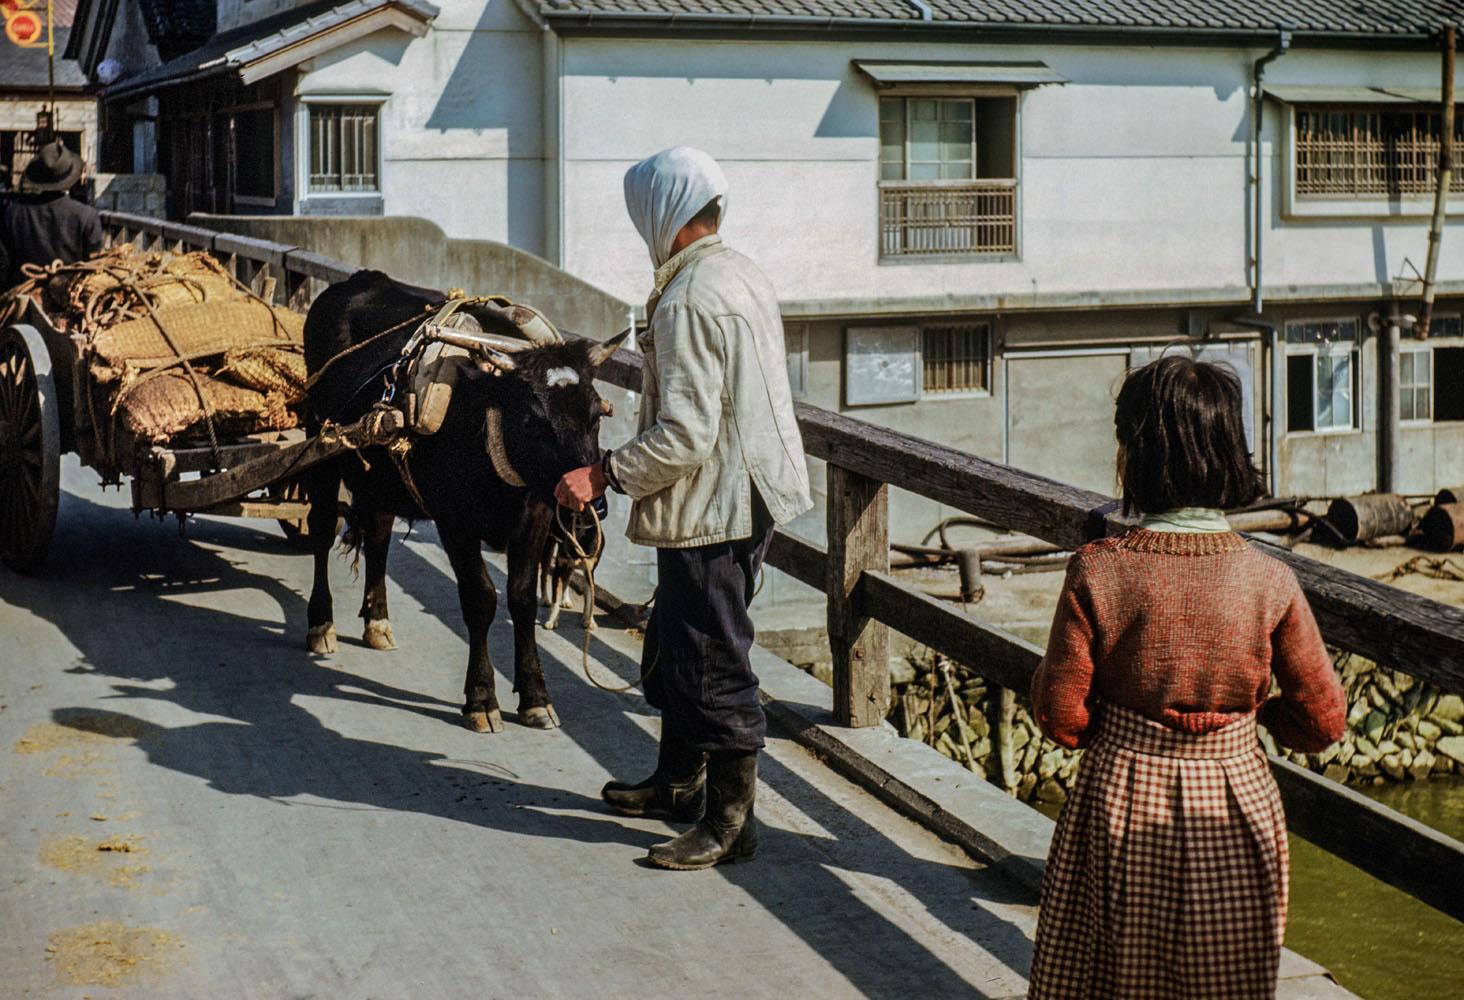 415-Kyukitakami Bridge, Ox Cart with load of ?